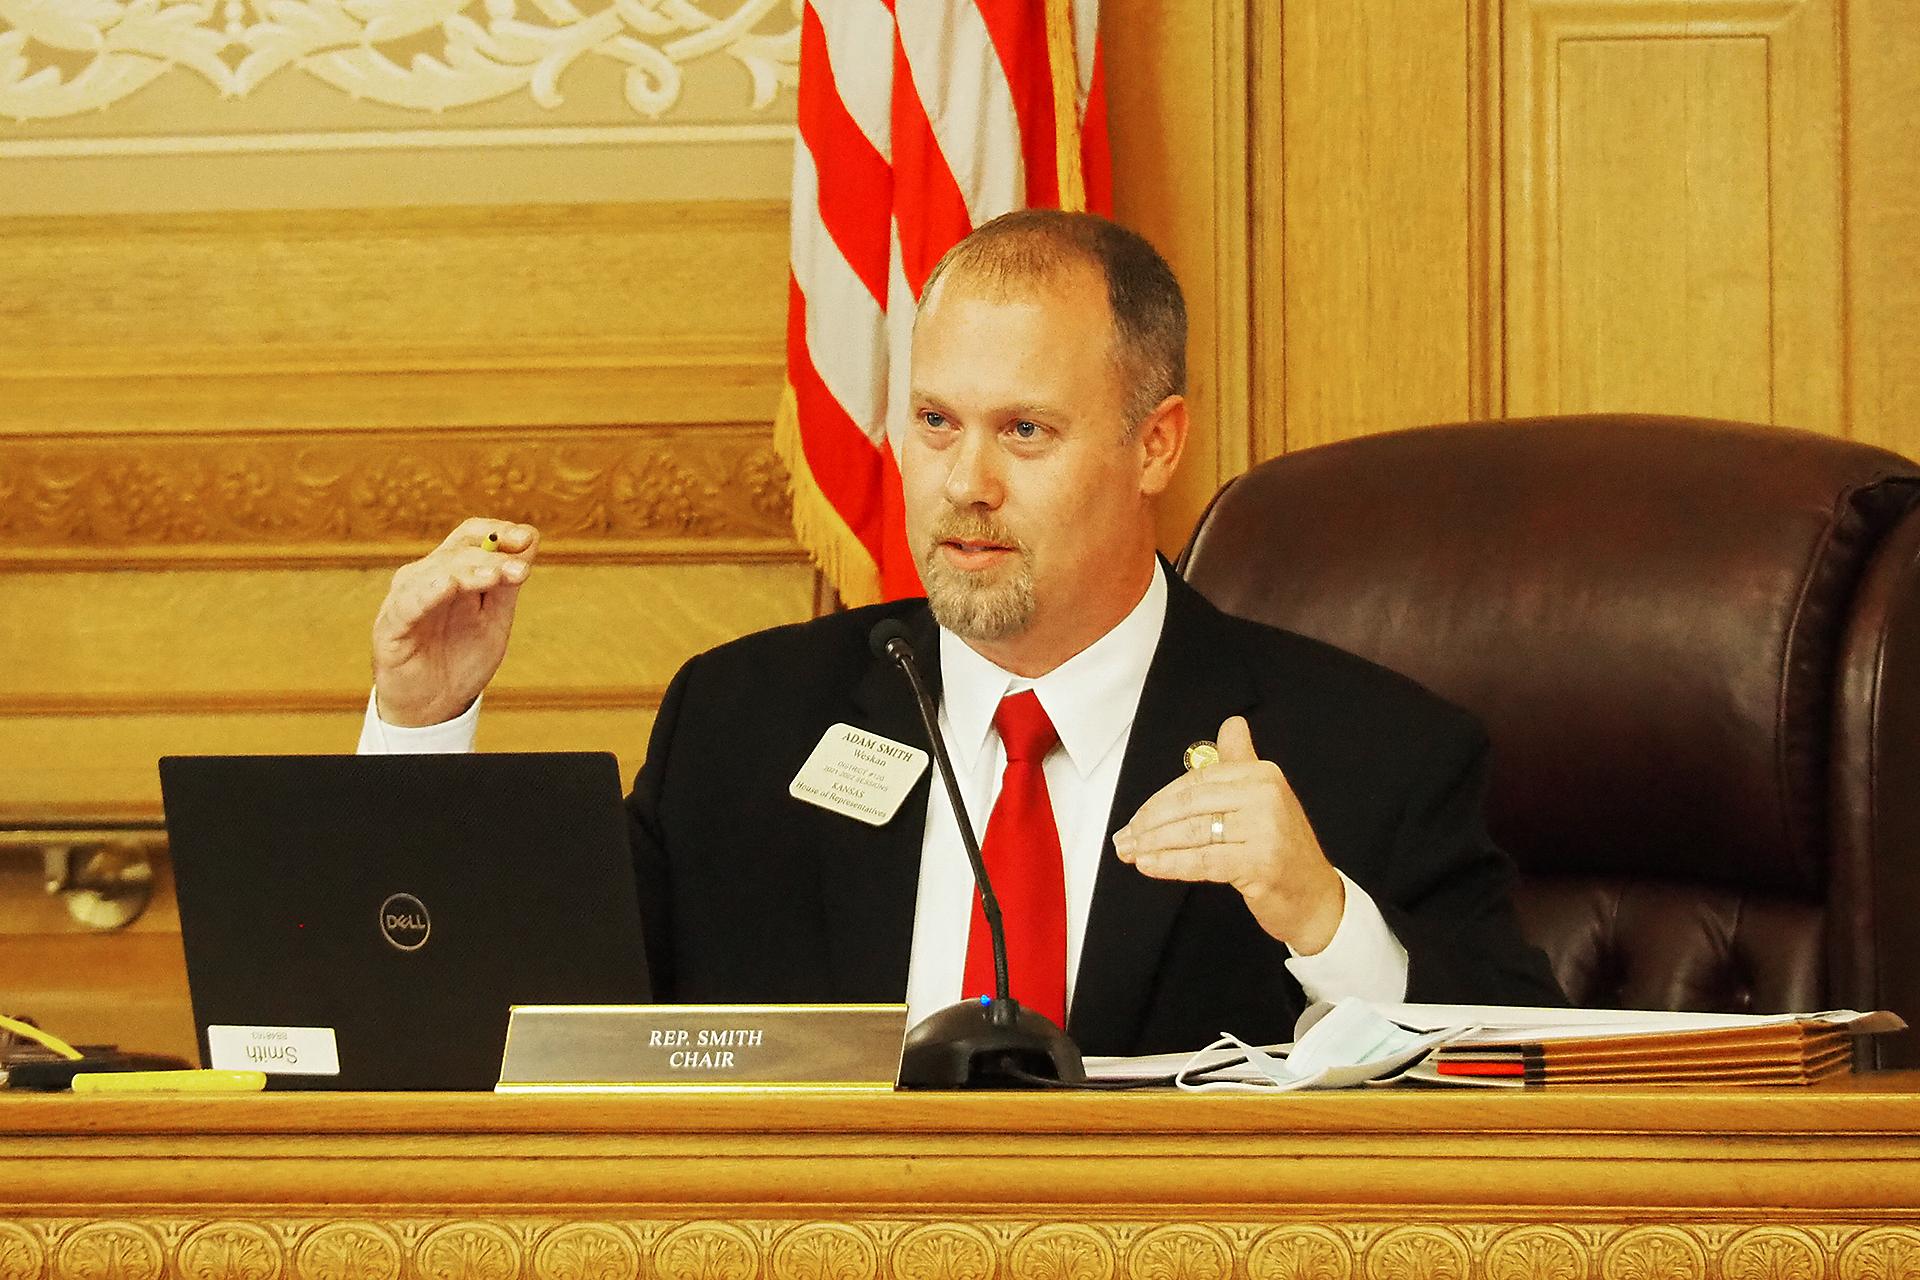 House advances $284M tax cut in response to Senate's $470M behemoth